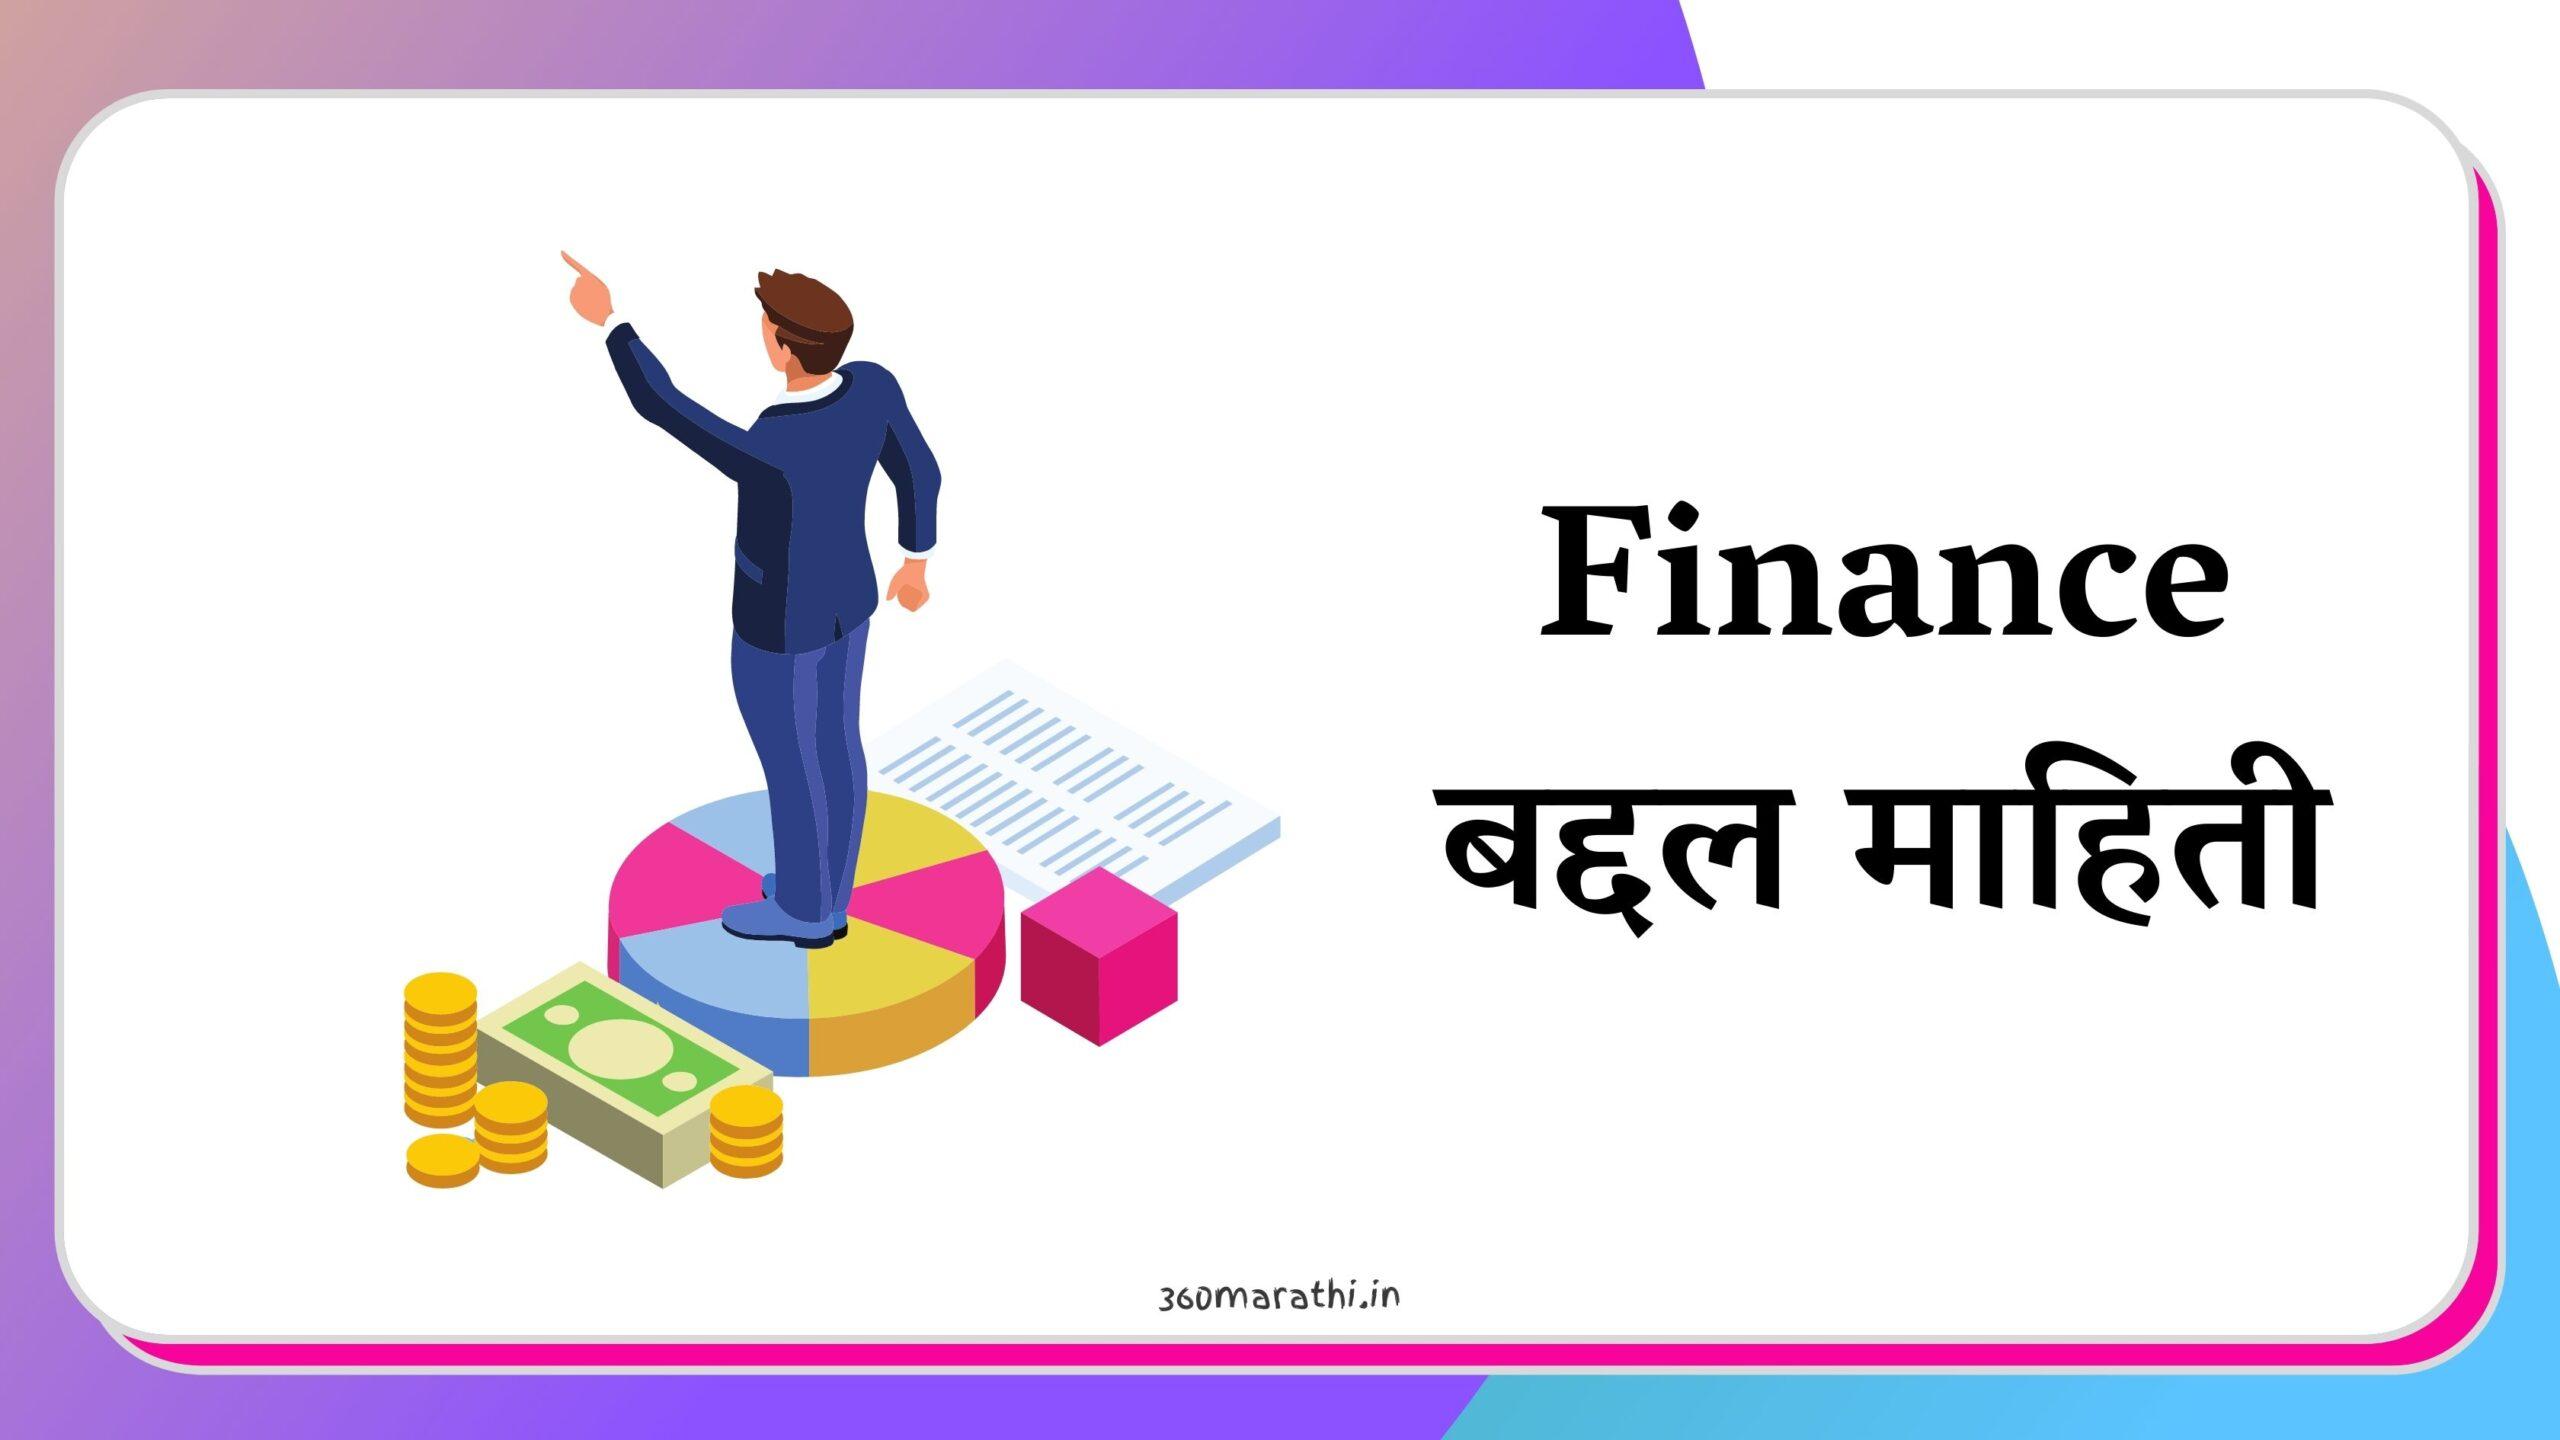 फायनान्स म्हणजे काय | Finance Information in Marathi